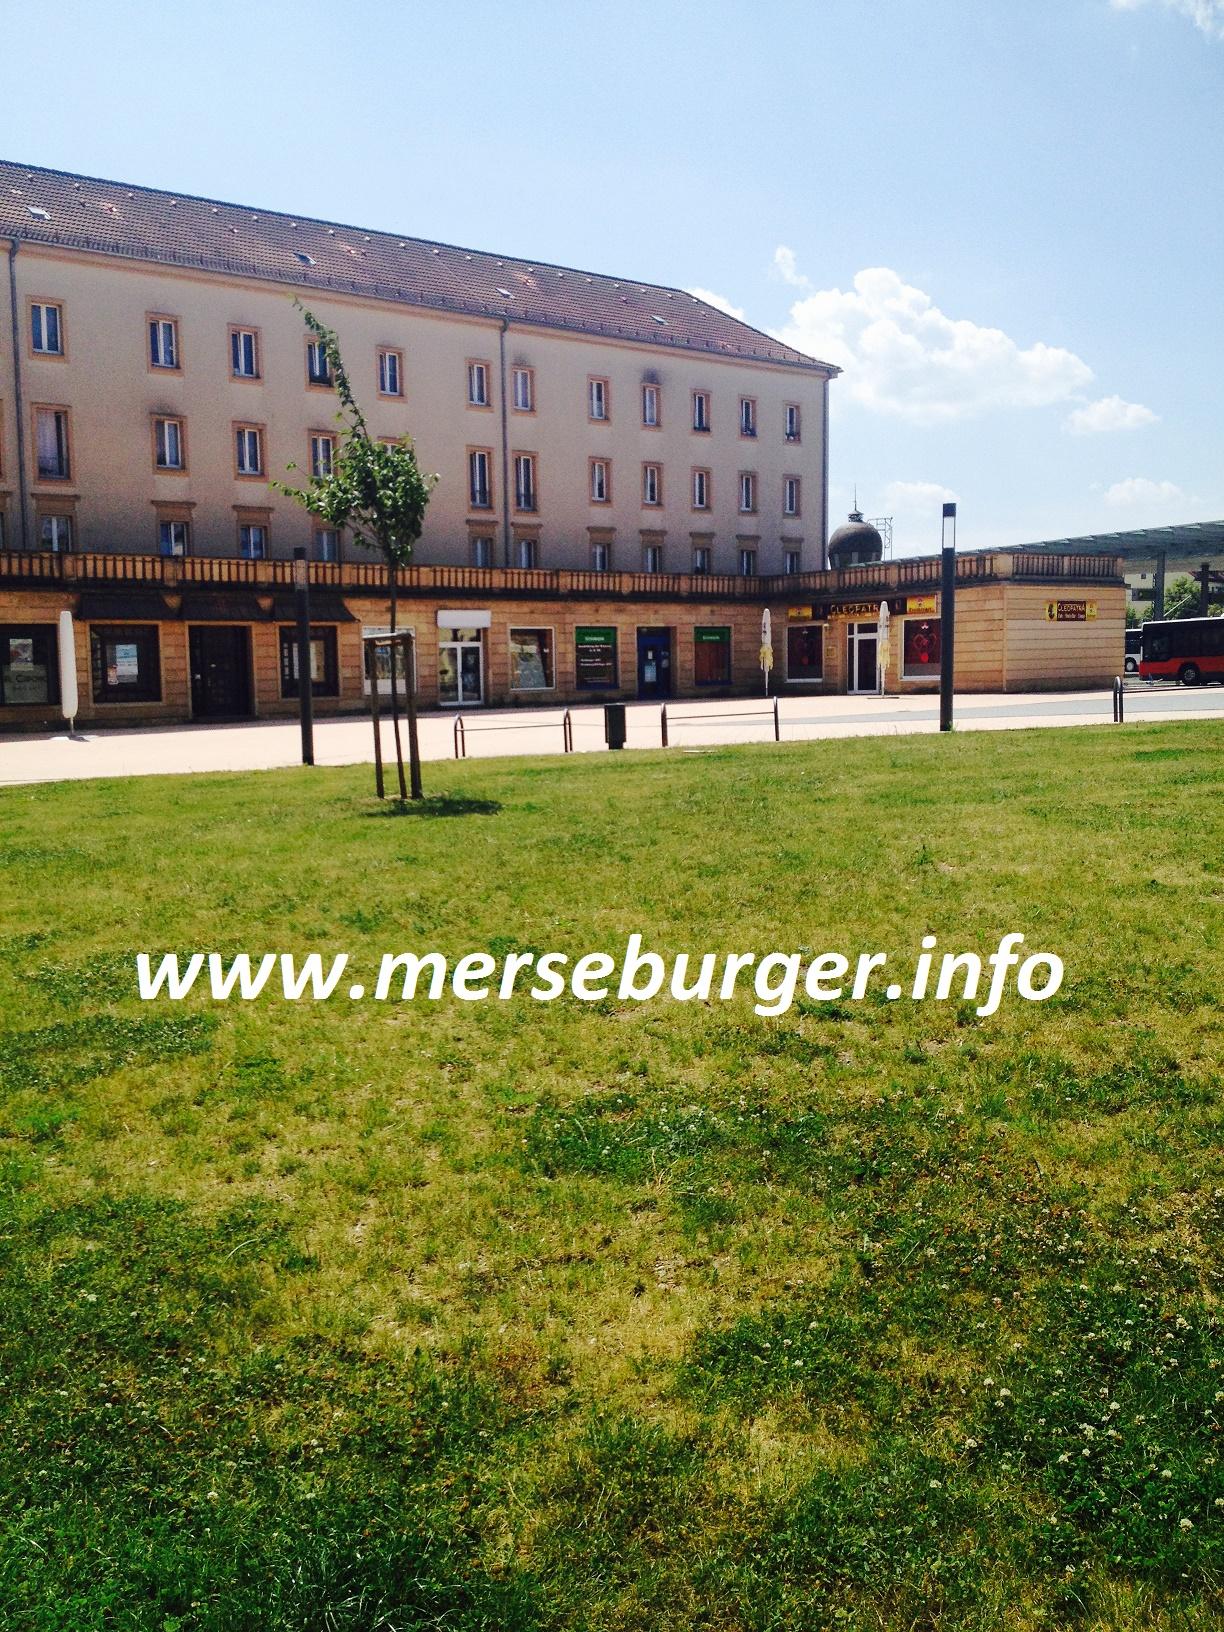 Busbahnhof-Platz-Merseburg